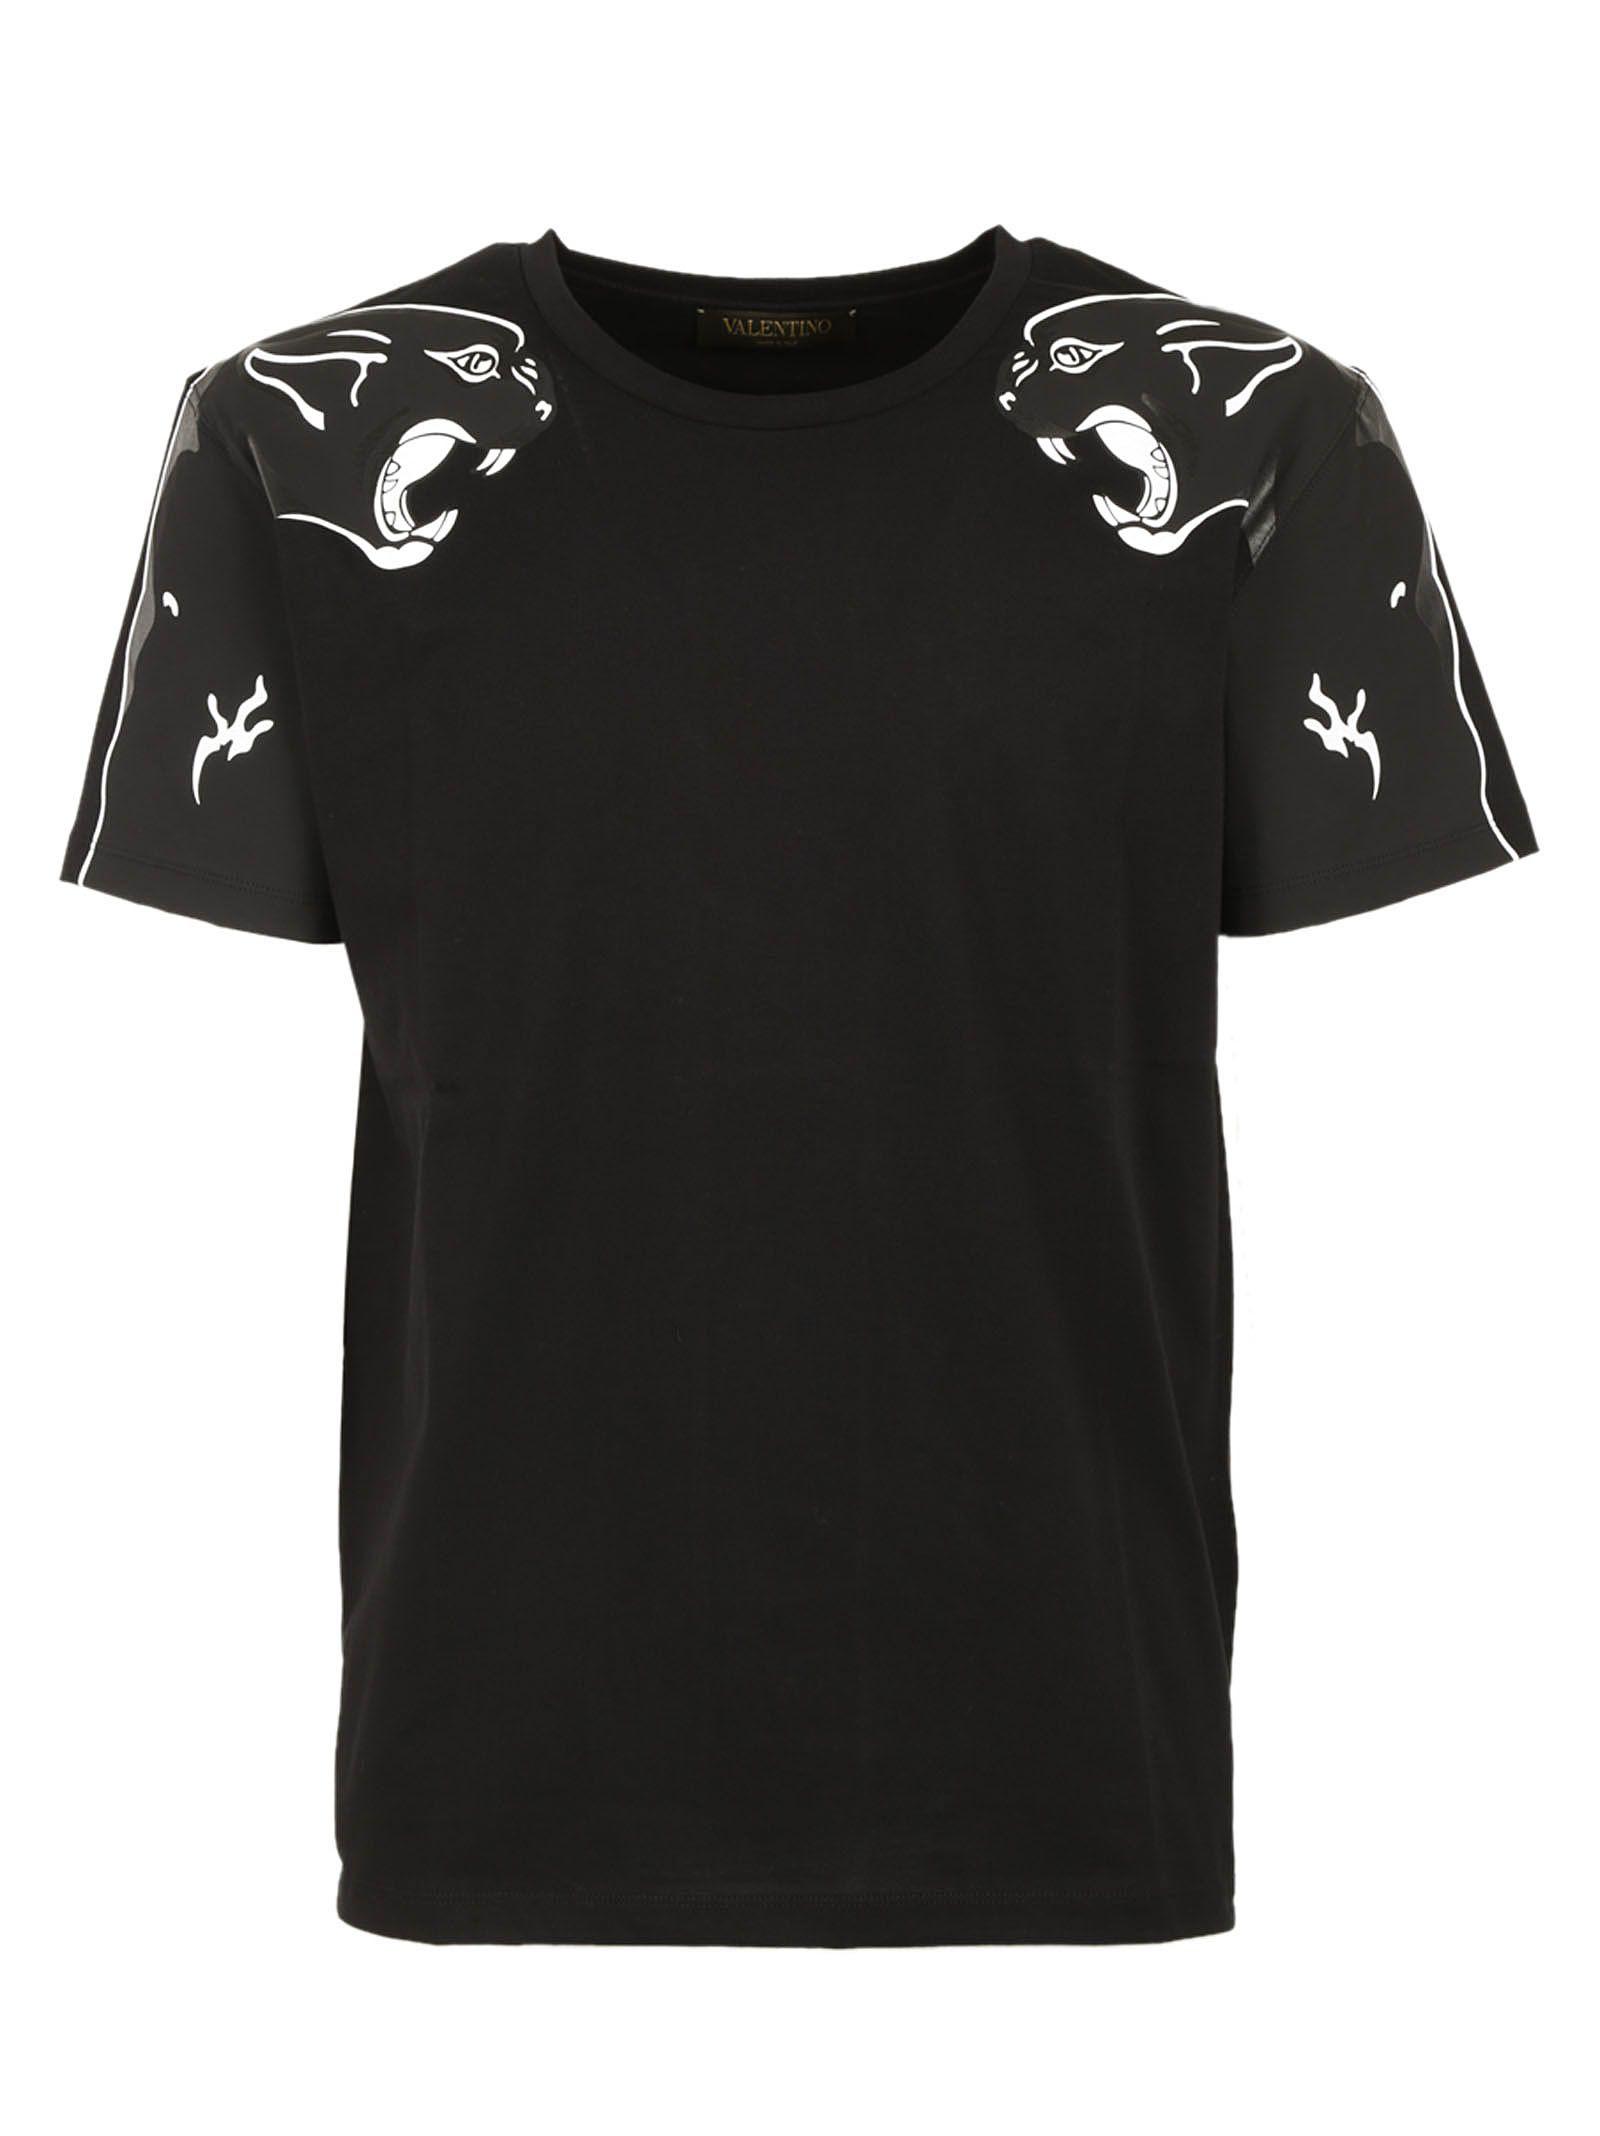 Valentino: Black Panther Print T-shirt